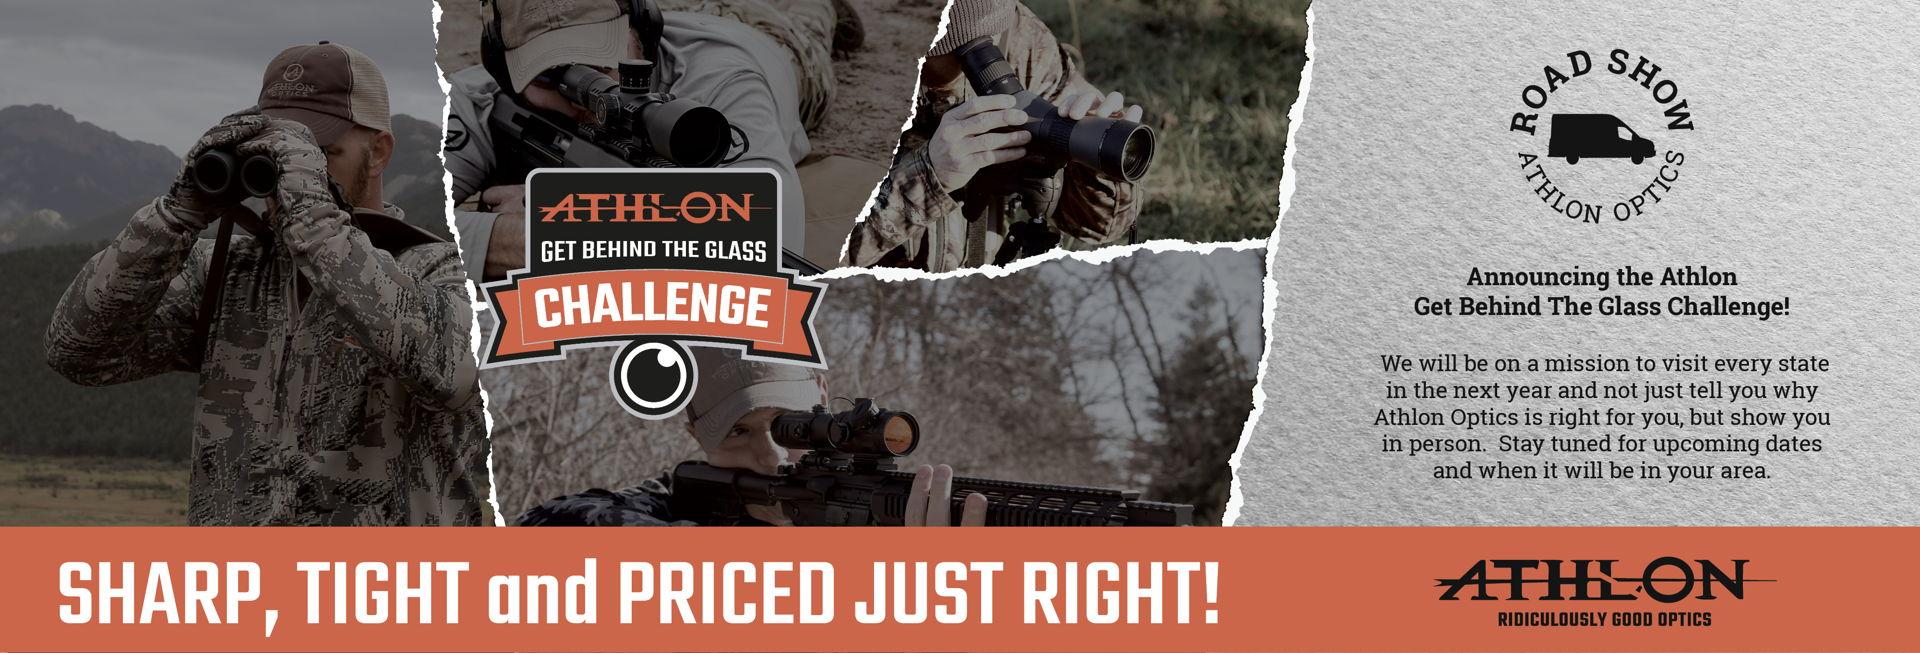 Athlon Optics - Rifle Scopes, Binoculars, Red Dot Scopes